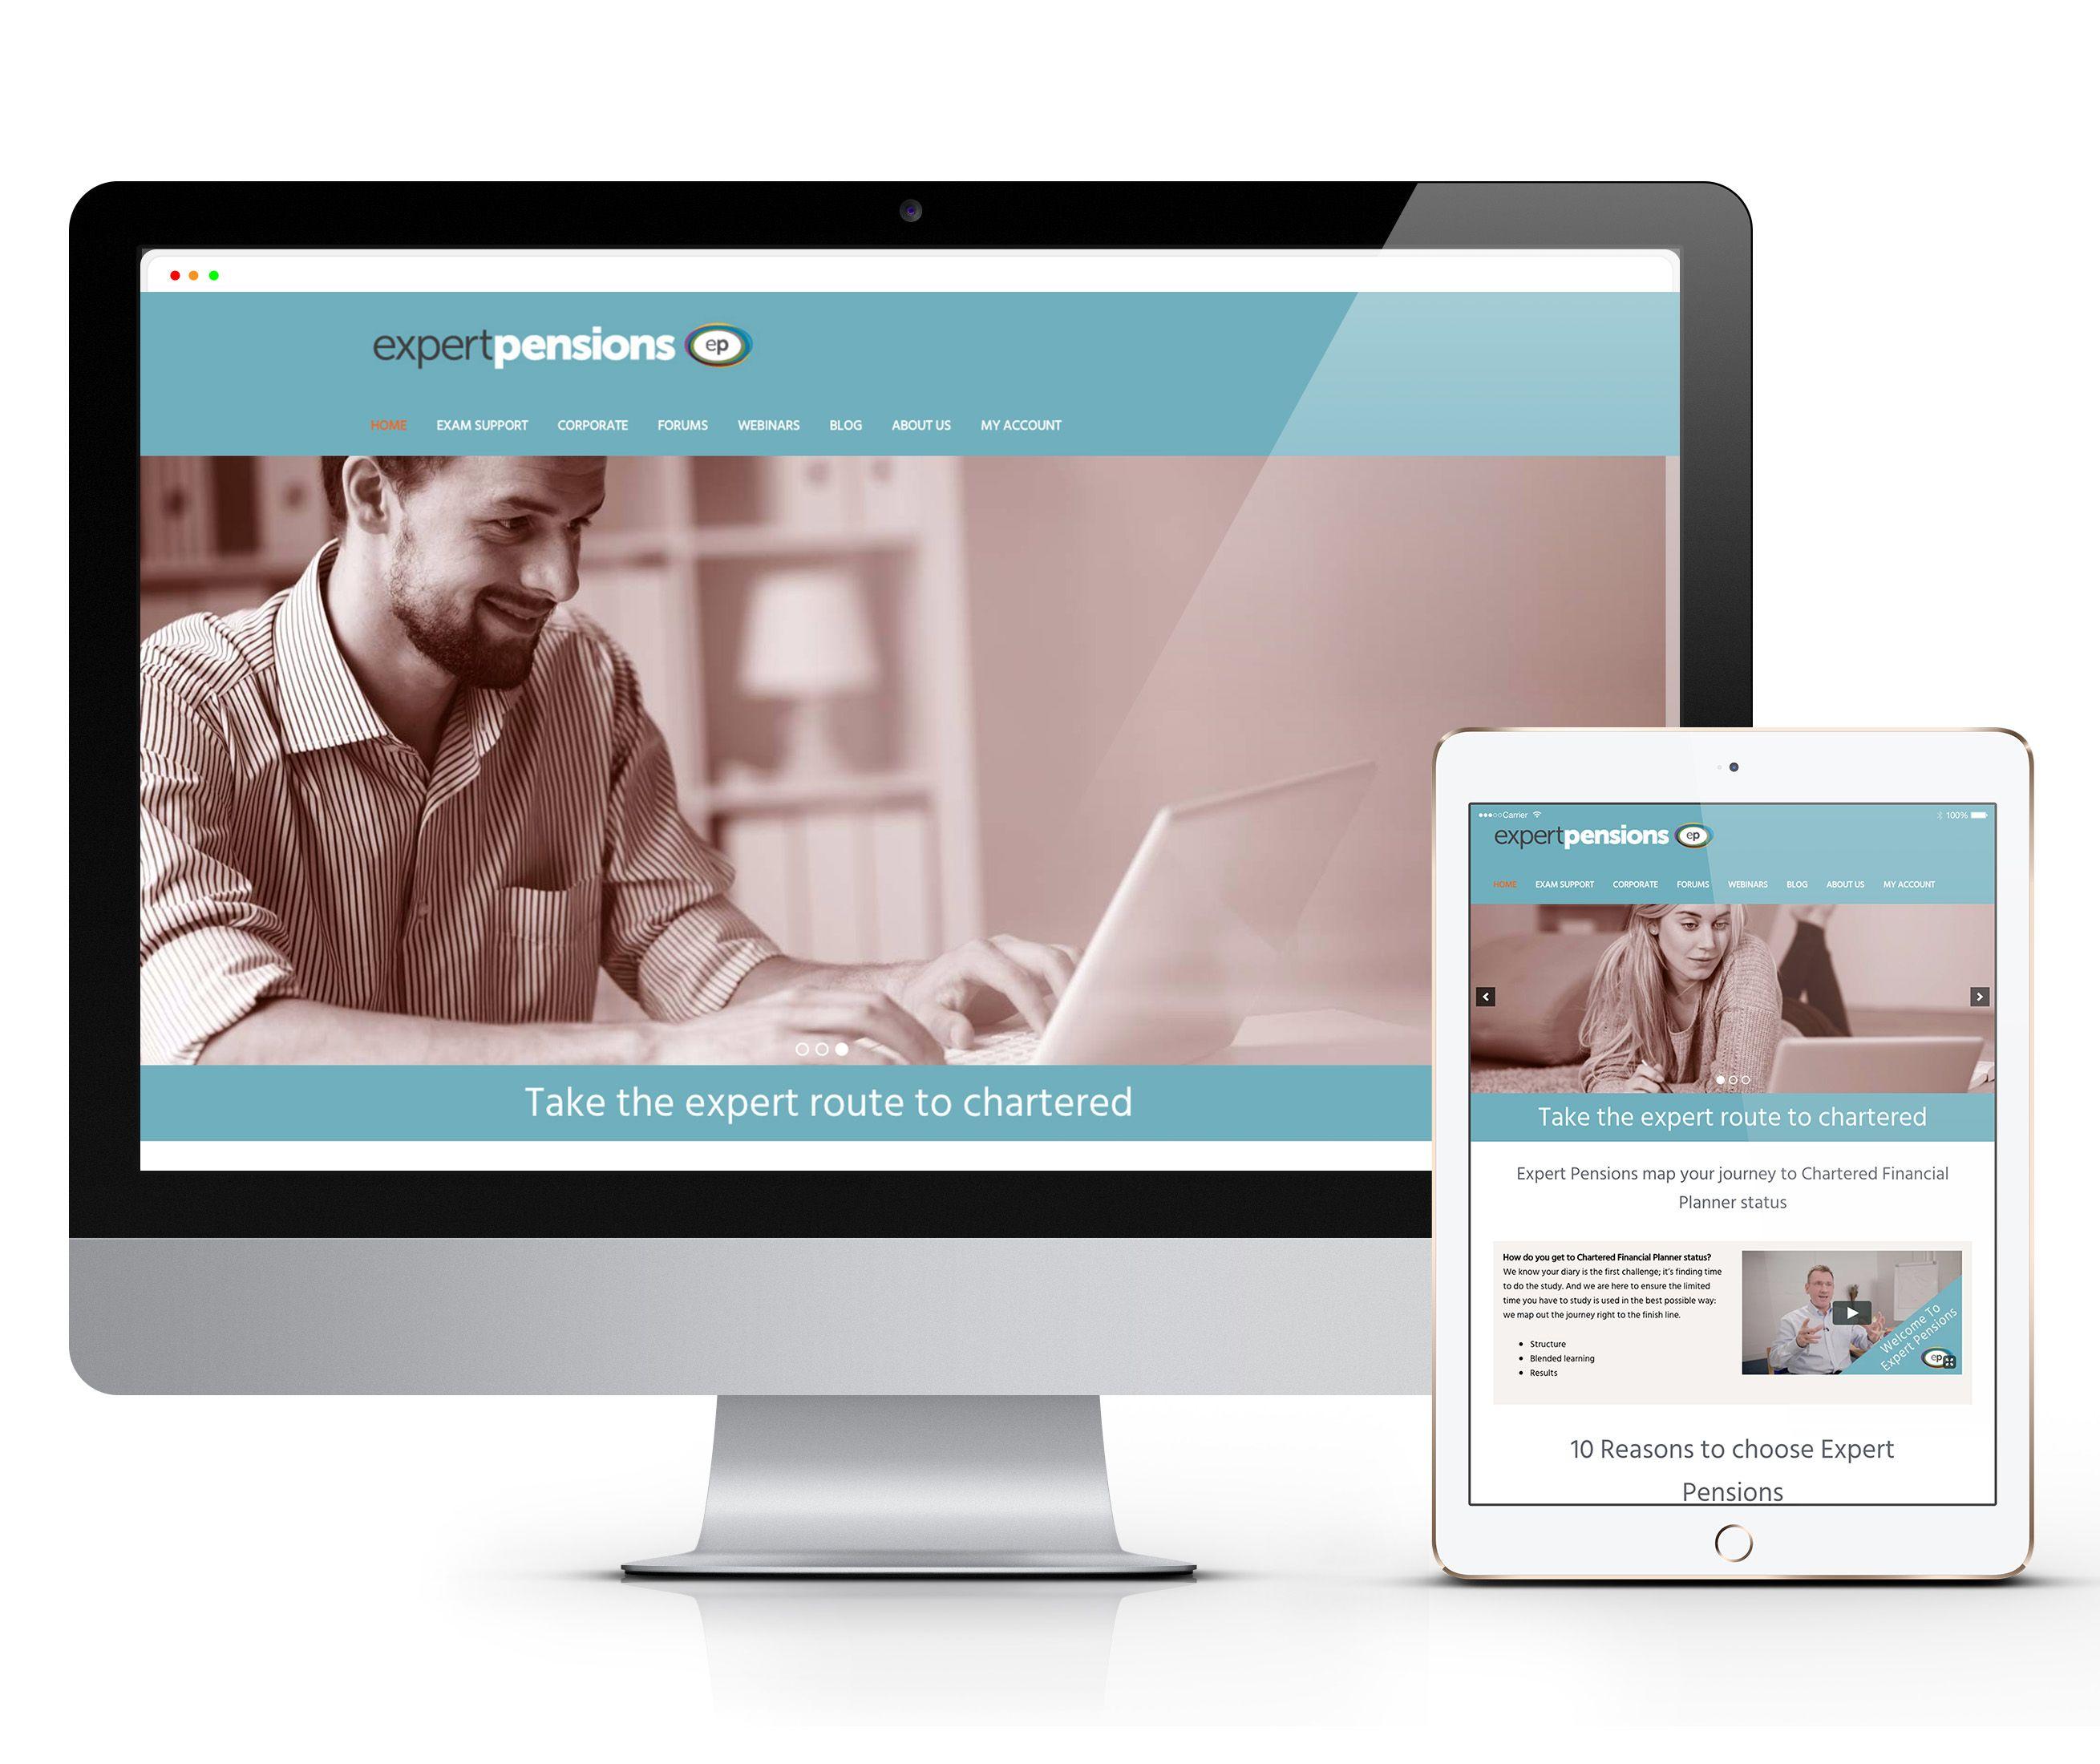 Expert Pensions Website on Desktop and Tablet